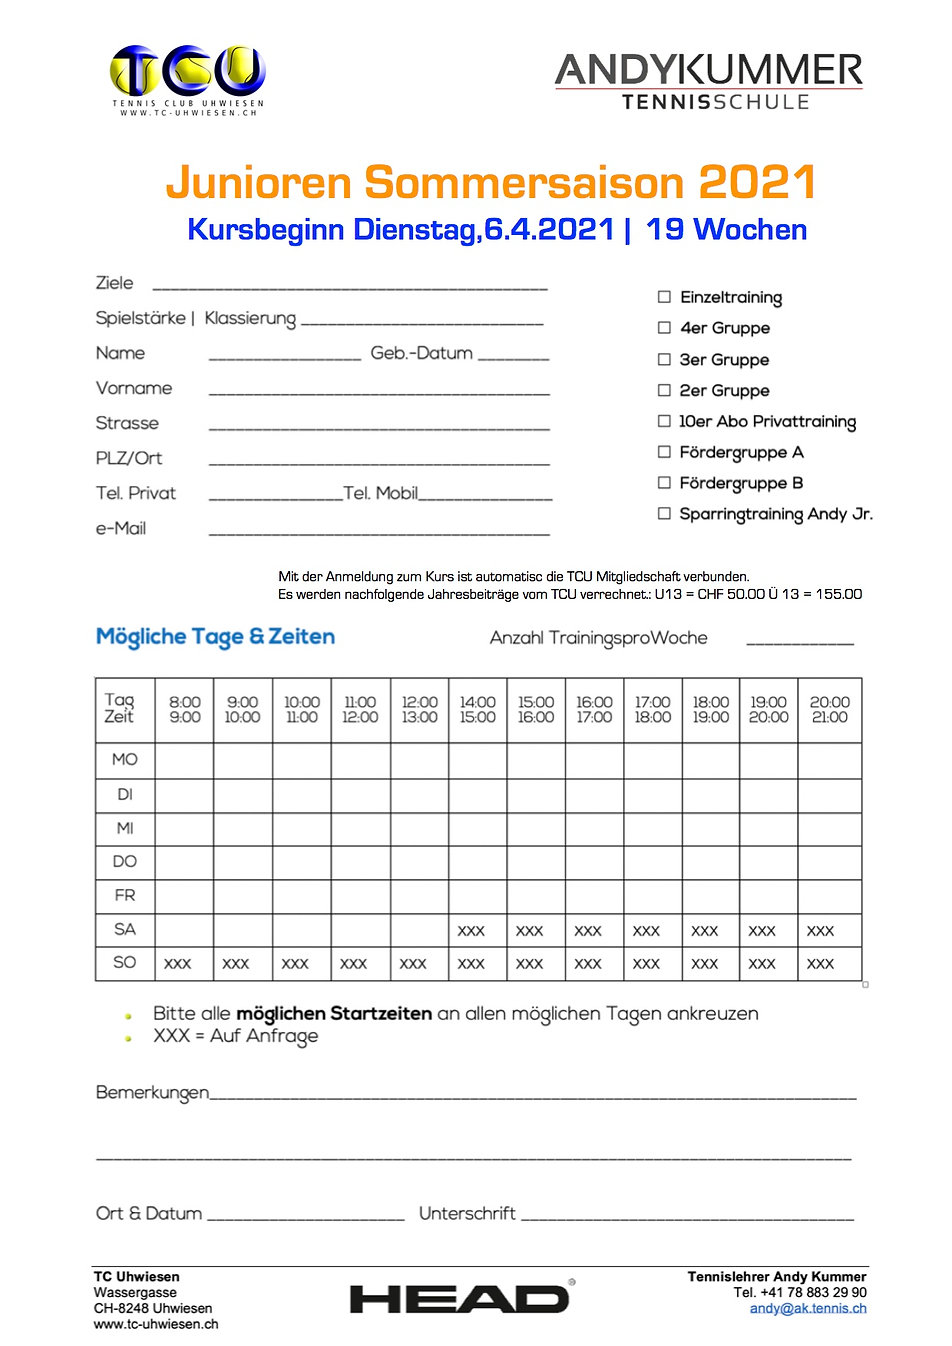 Anmeldung_Junioren Sommer 2021 | AKT Ten